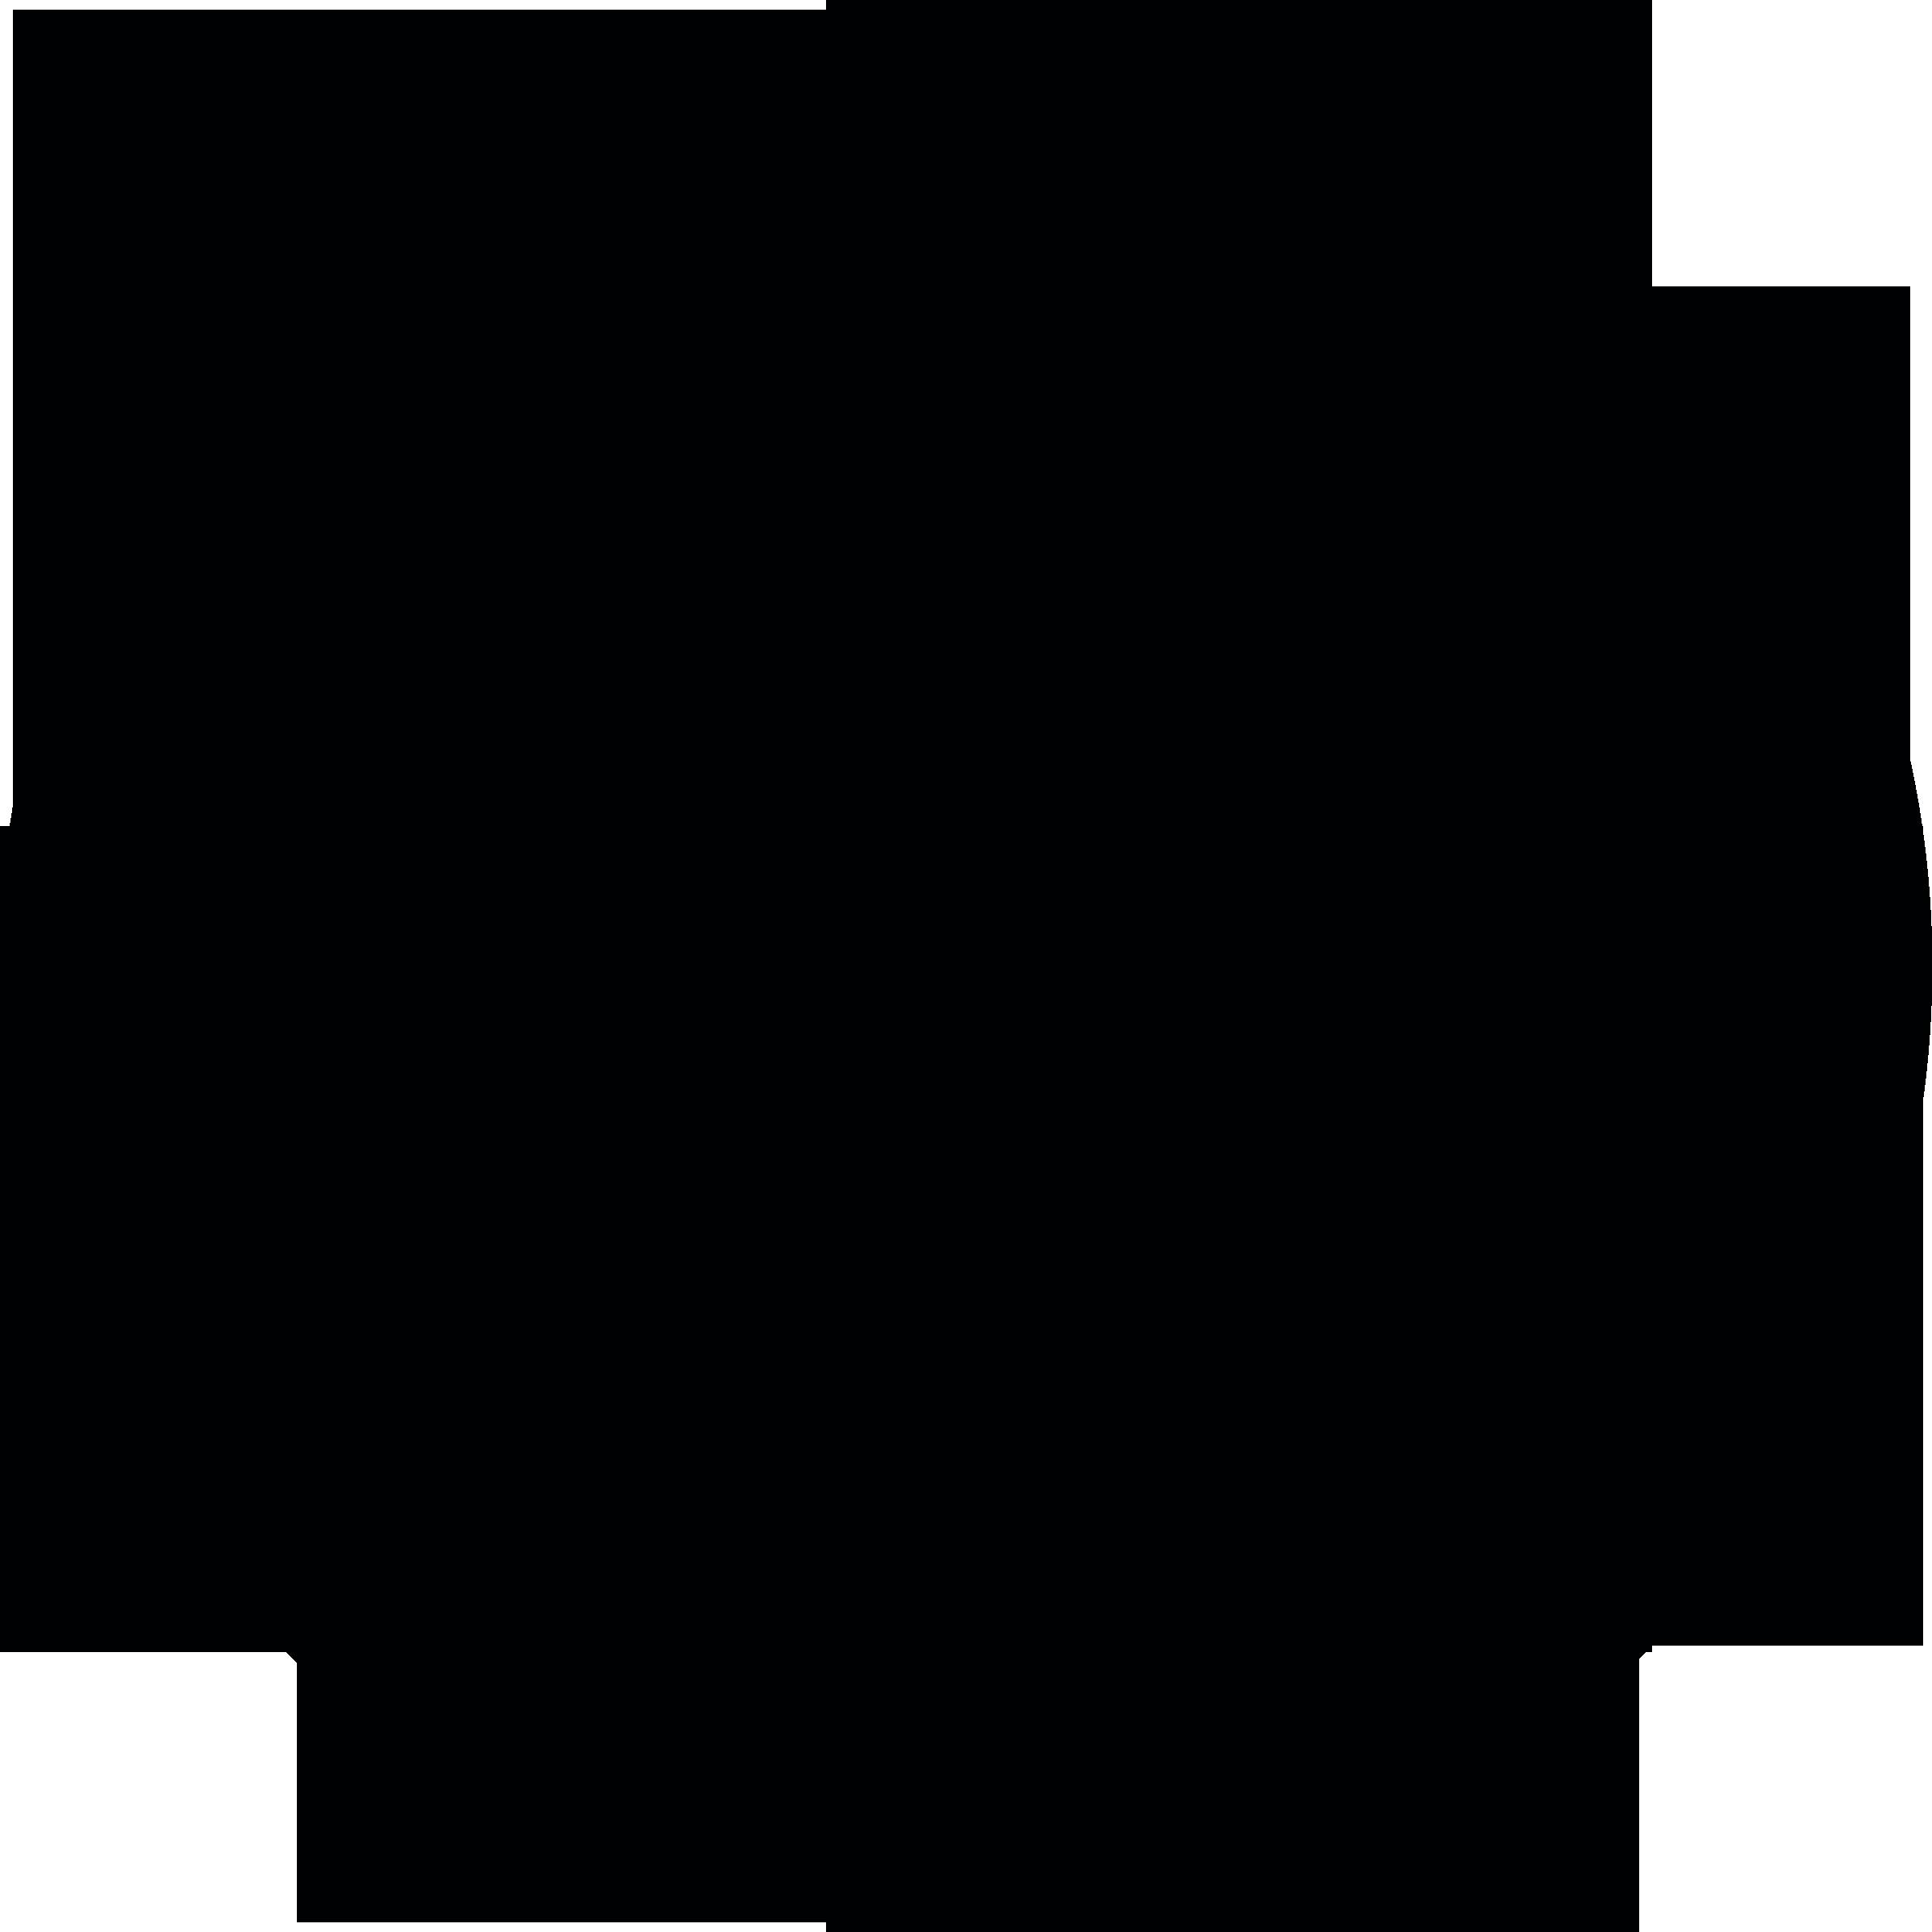 atelier_dojo_local_circle_black_9-13-2017.png